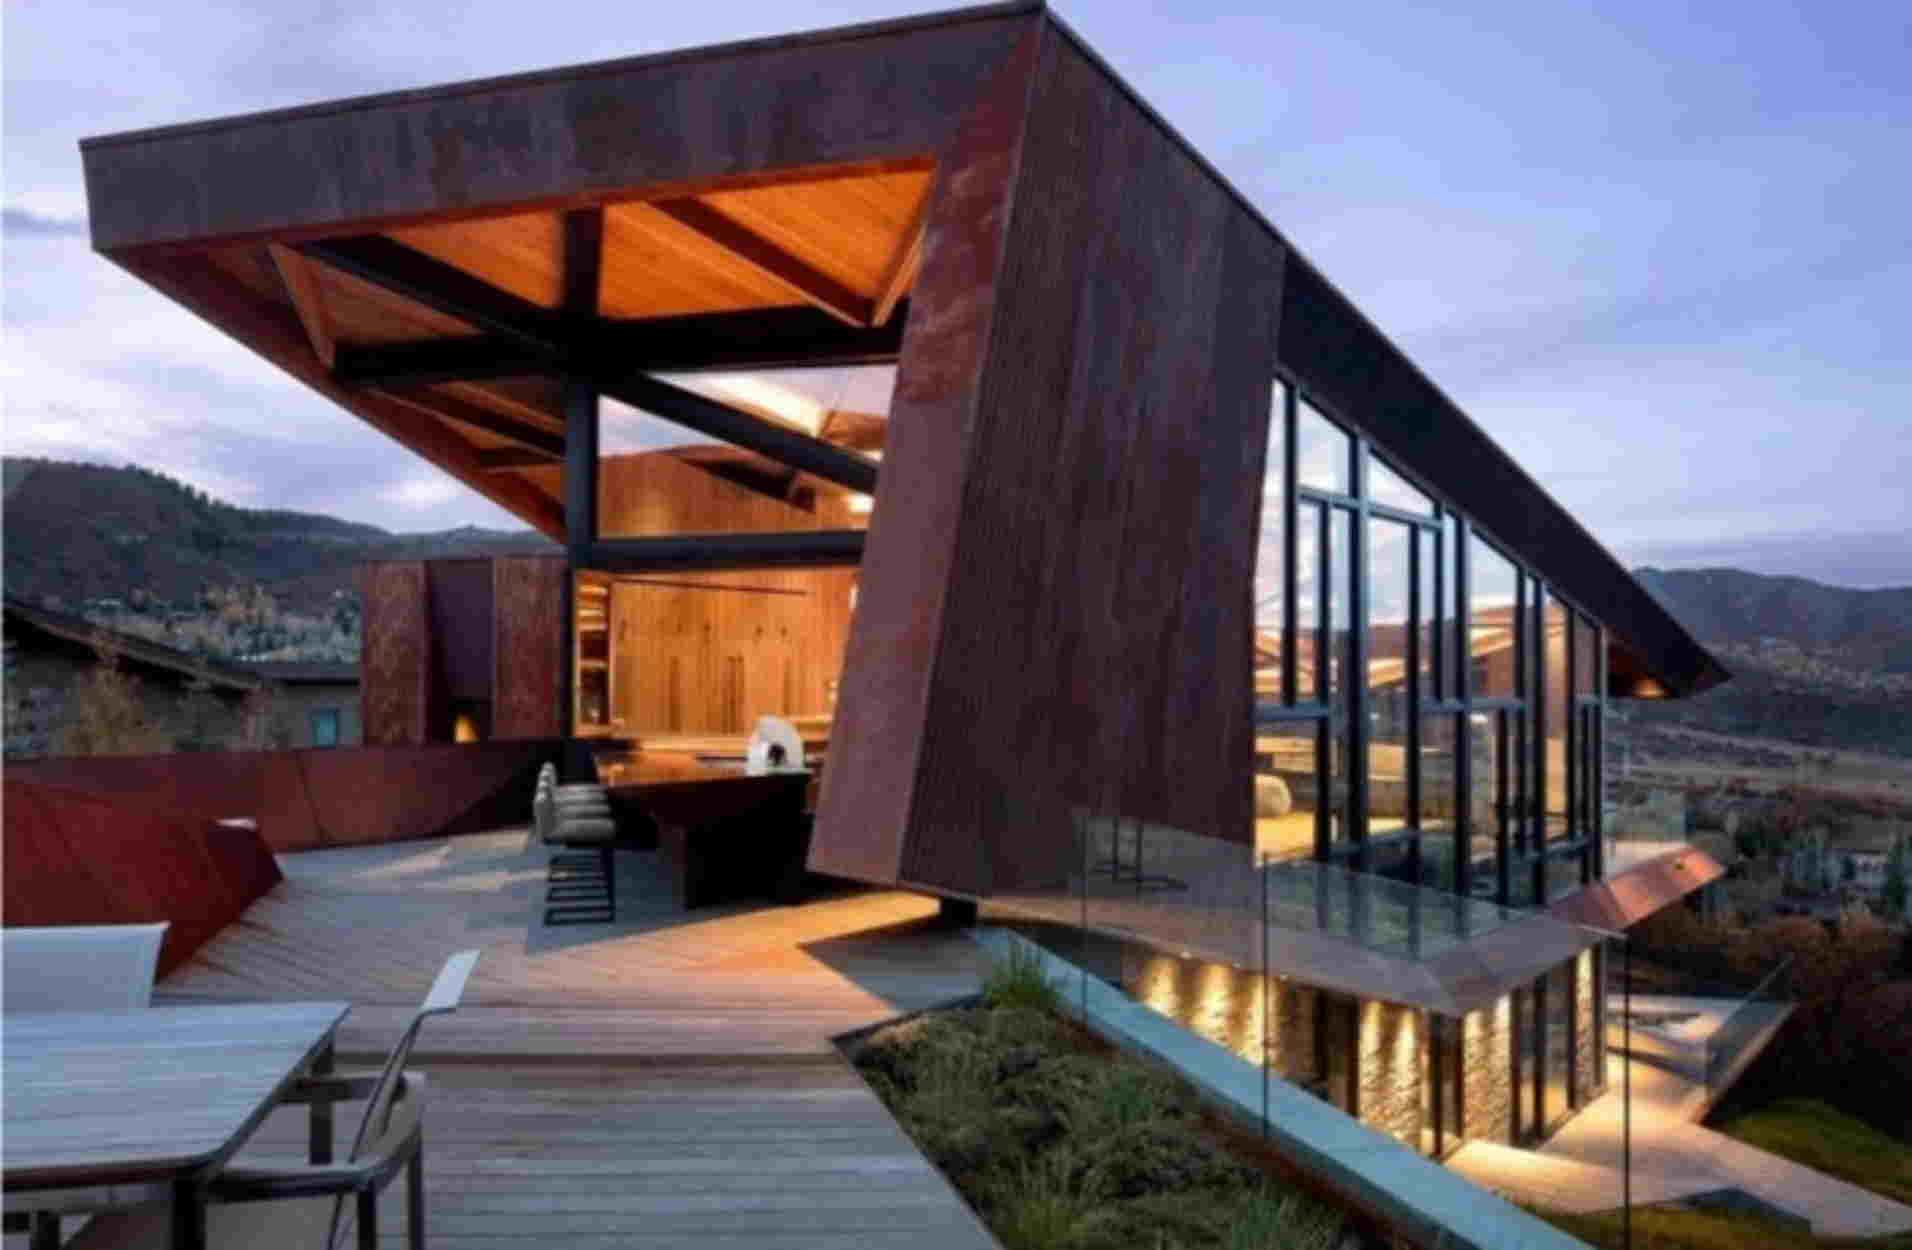 Owl Creek: Η ξύλινη κατοικία που θα θέλαμε να περάσουμε όλο το 2021!